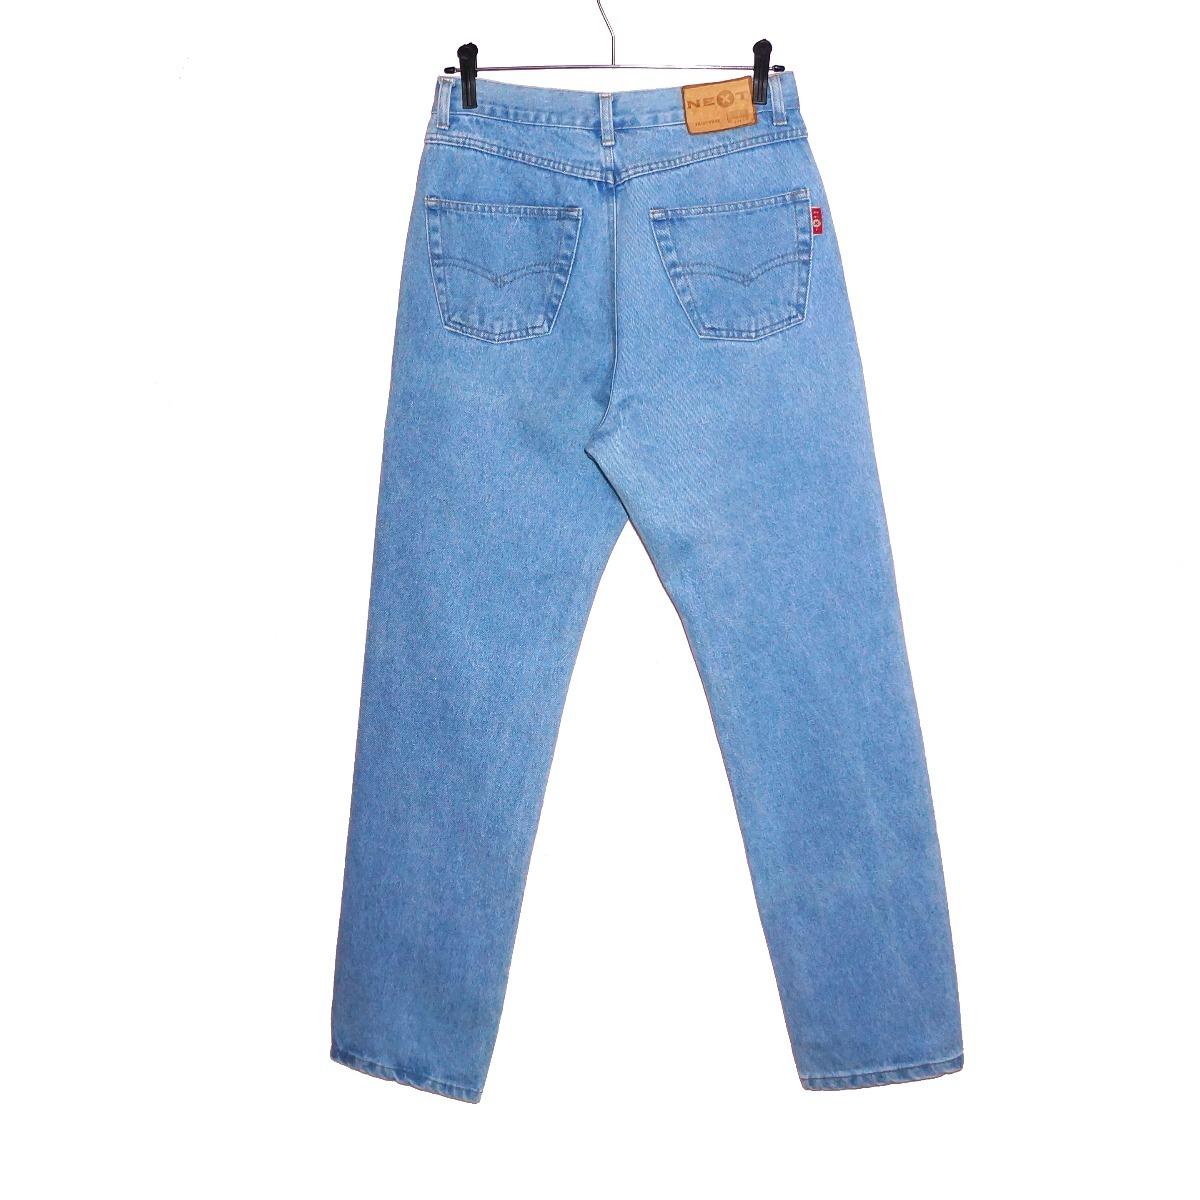 aa6adf7cb1 calça mom jeans clássica vintage clara cintura alta unisex. Carregando zoom.